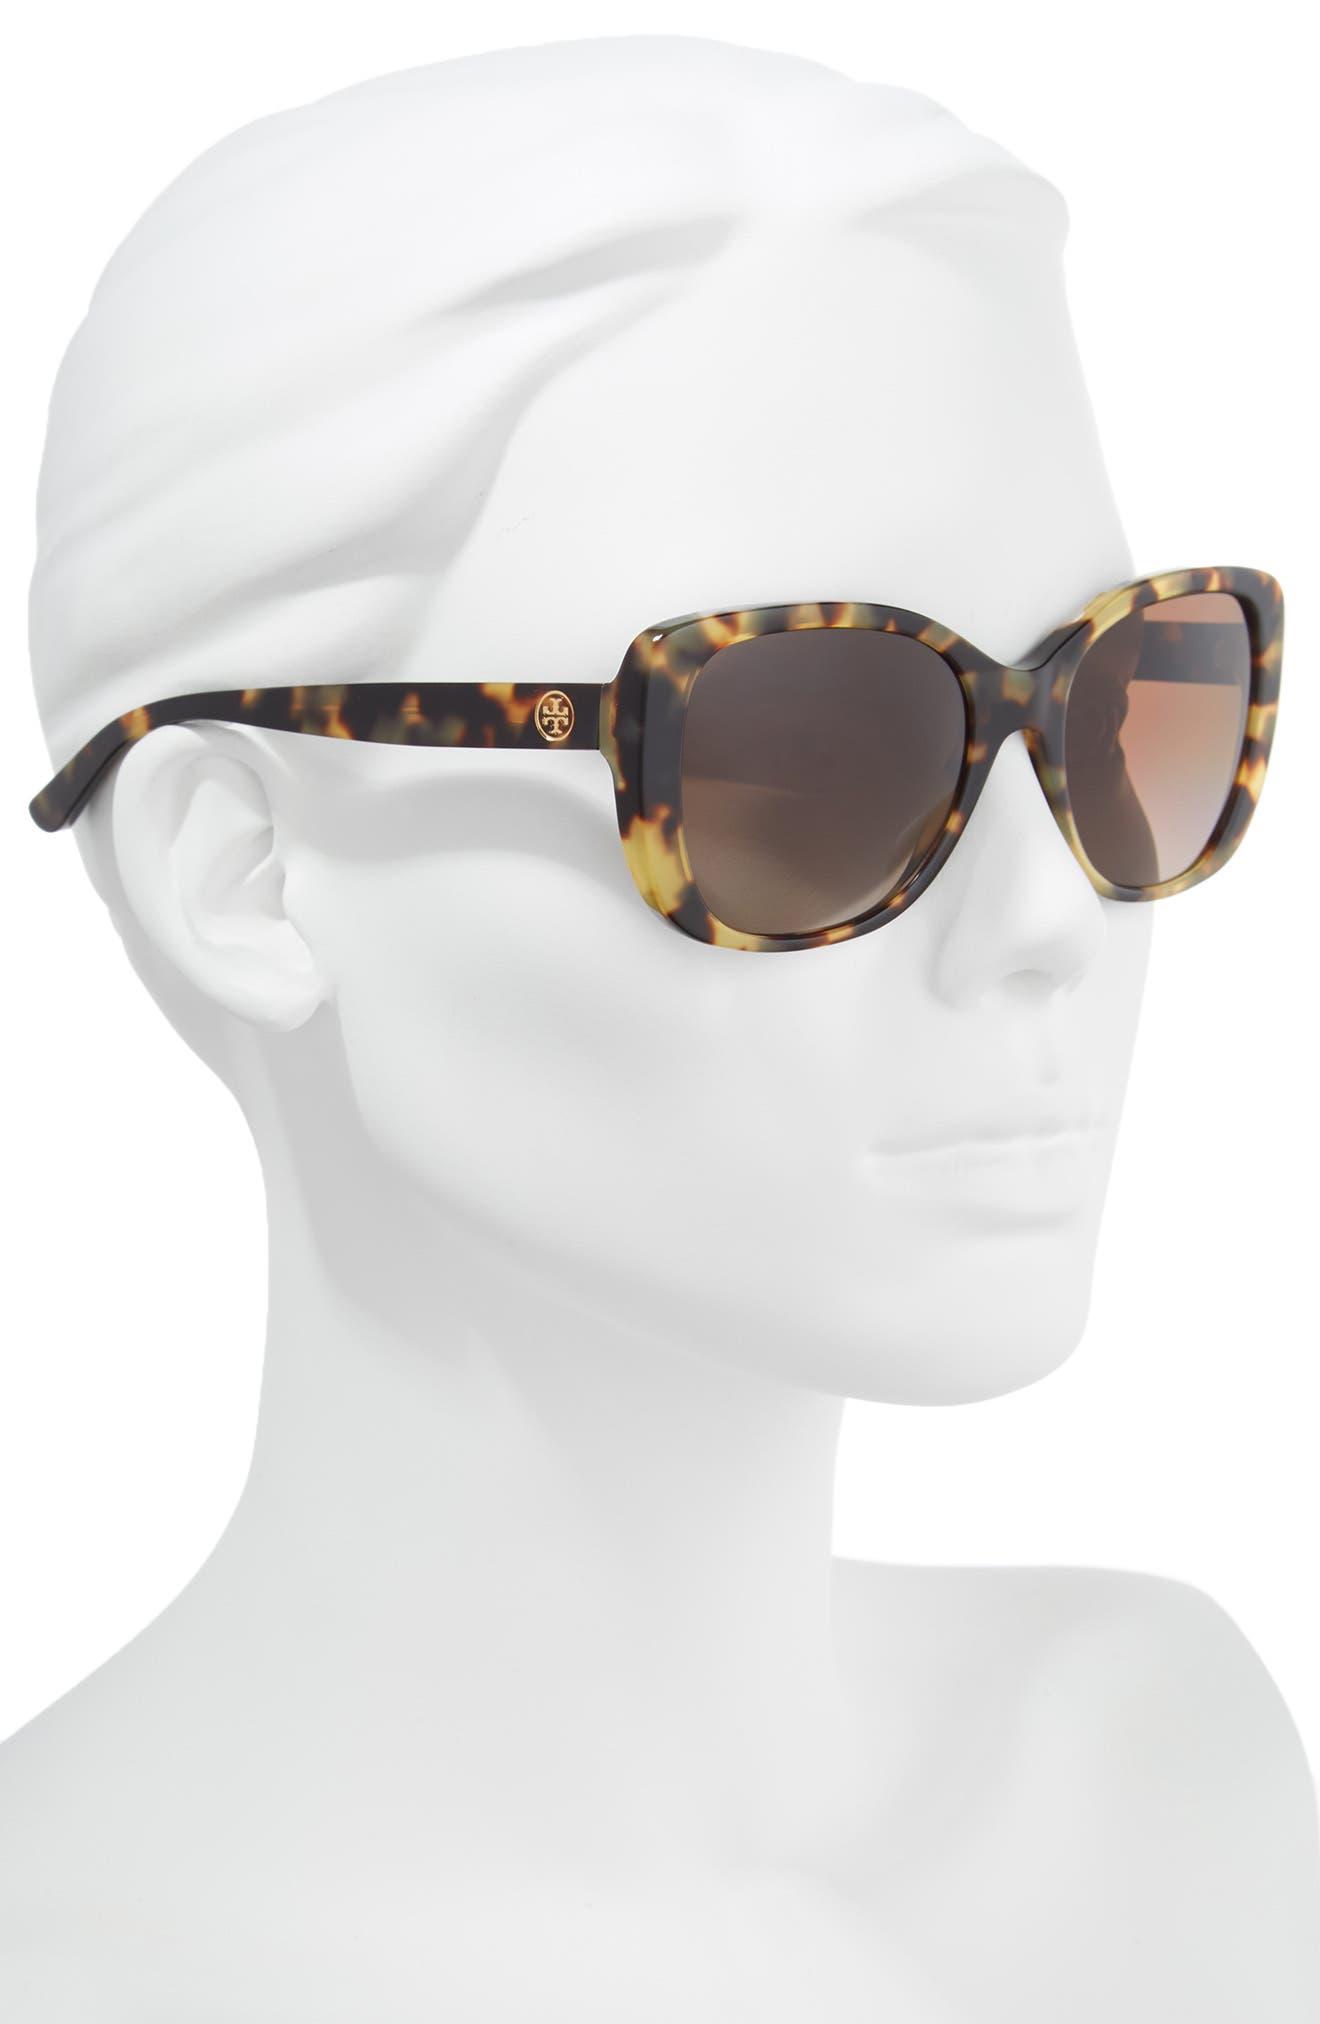 53mm Polarized Rectangle Sunglasses,                             Alternate thumbnail 2, color,                             TOKYO TORTOISE GRADIENT